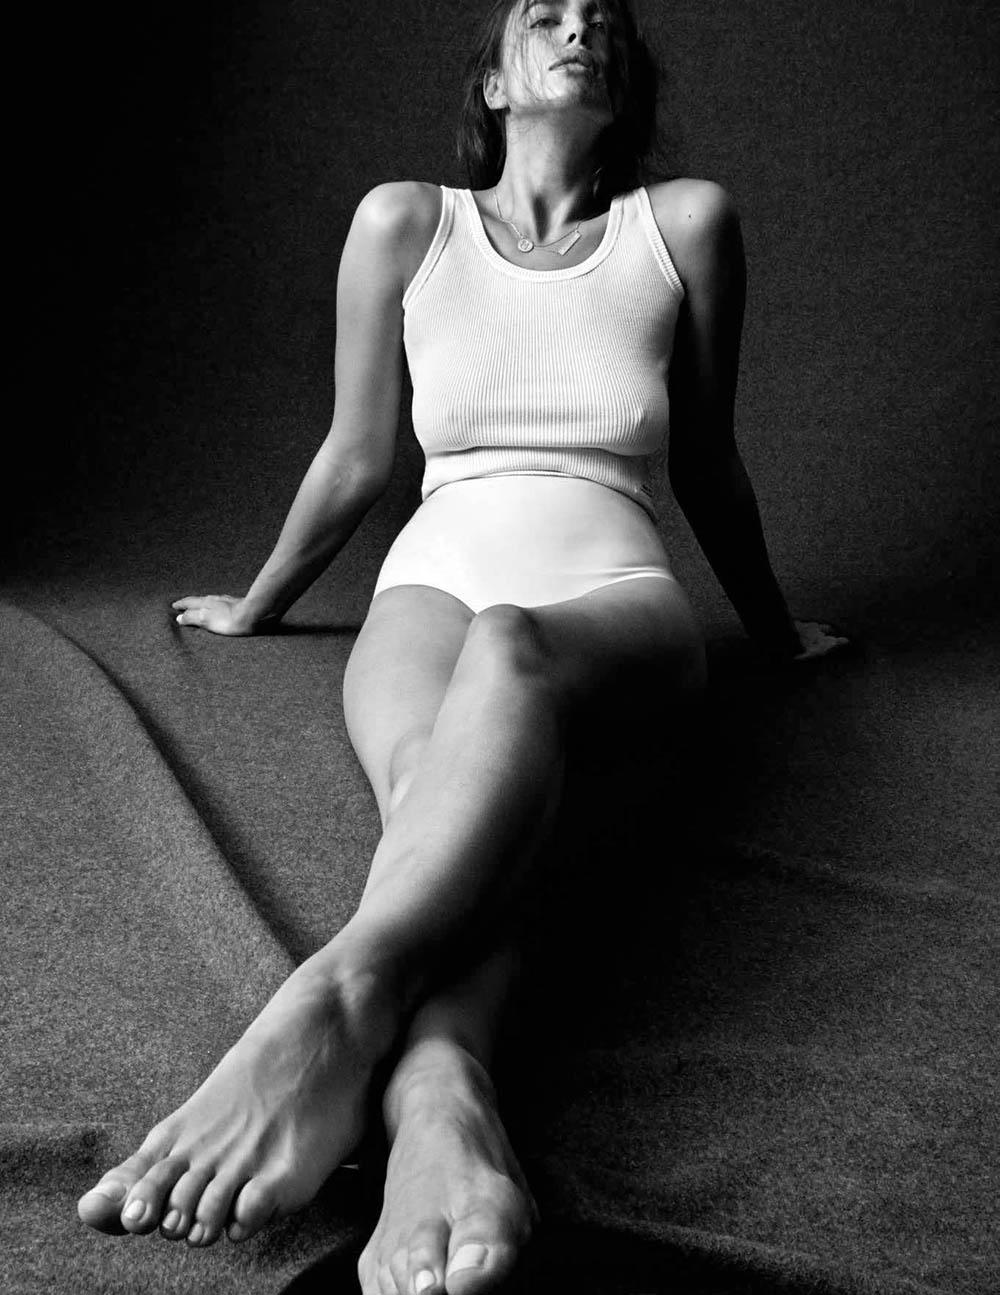 Irina Shayk covers Vogue Germany April 2018 by Daniel Jackson